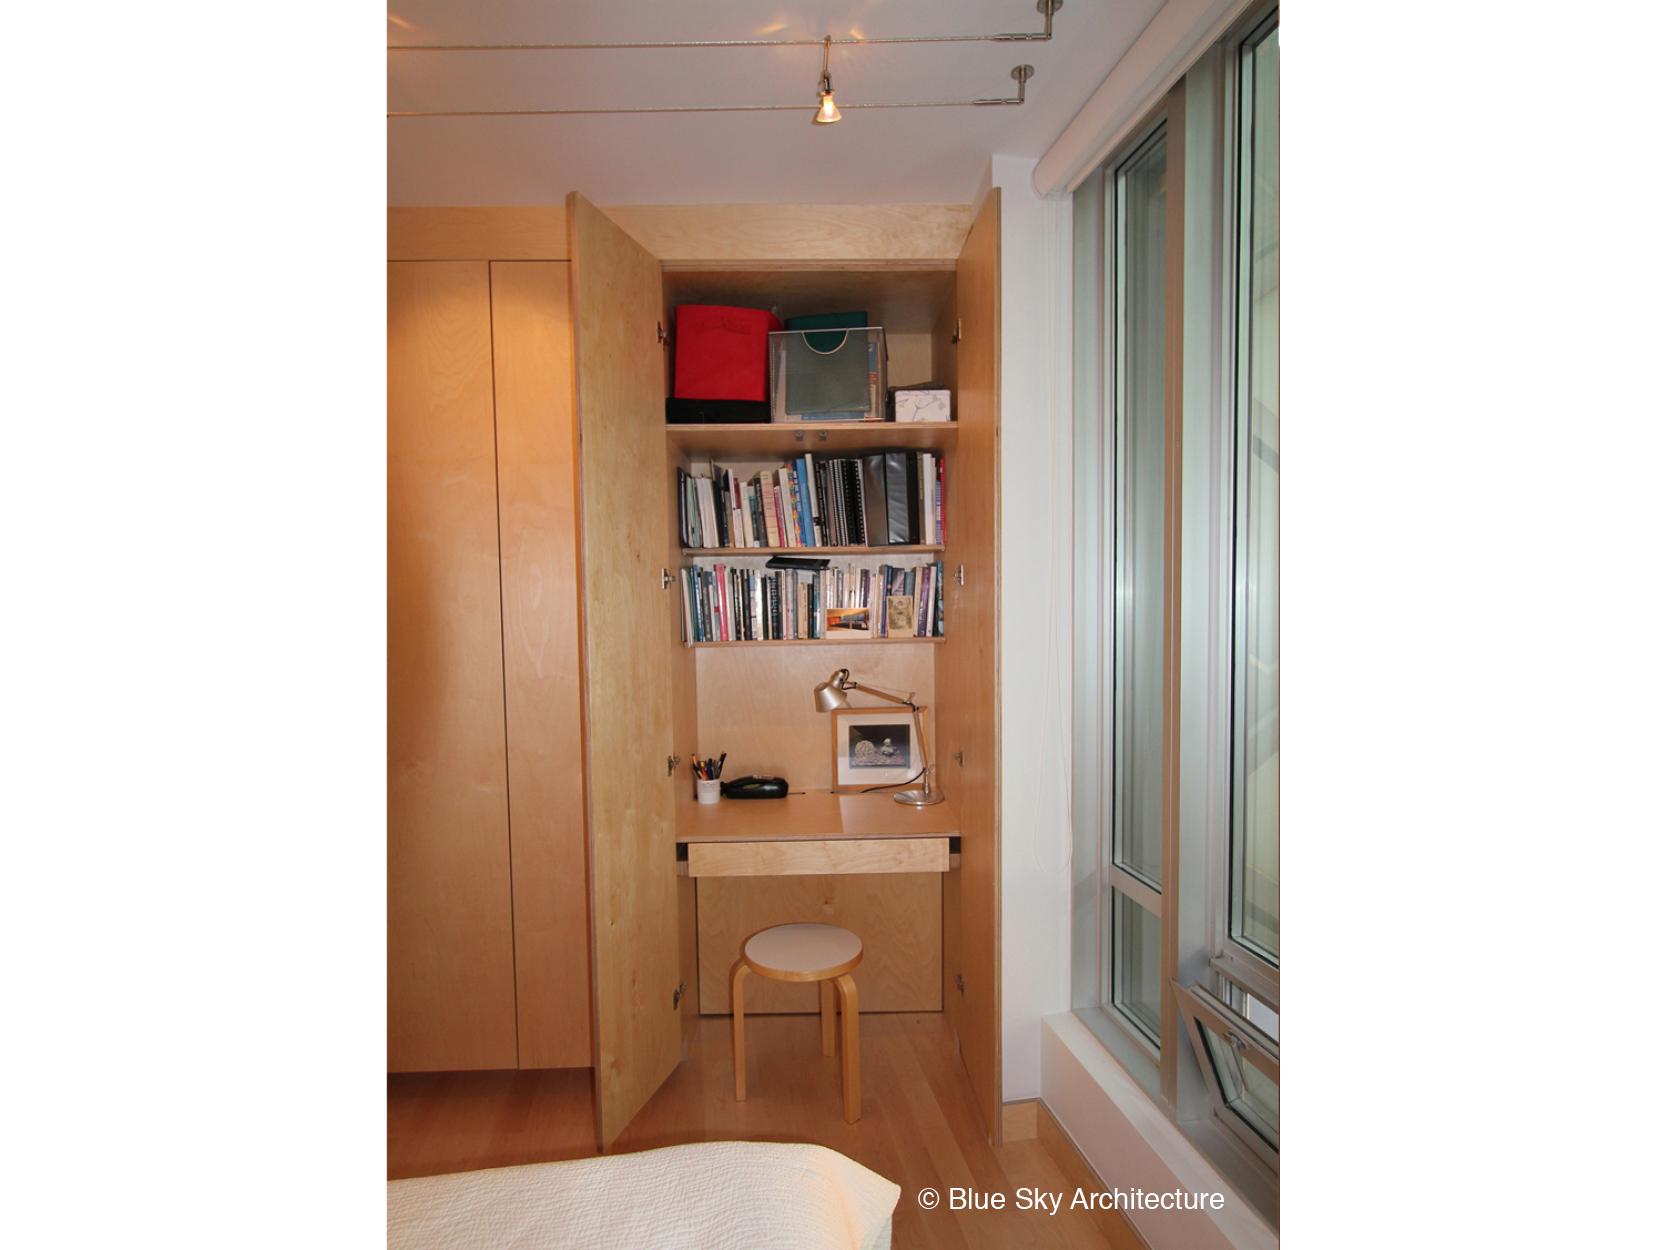 Vancouver condo with closet deskspace